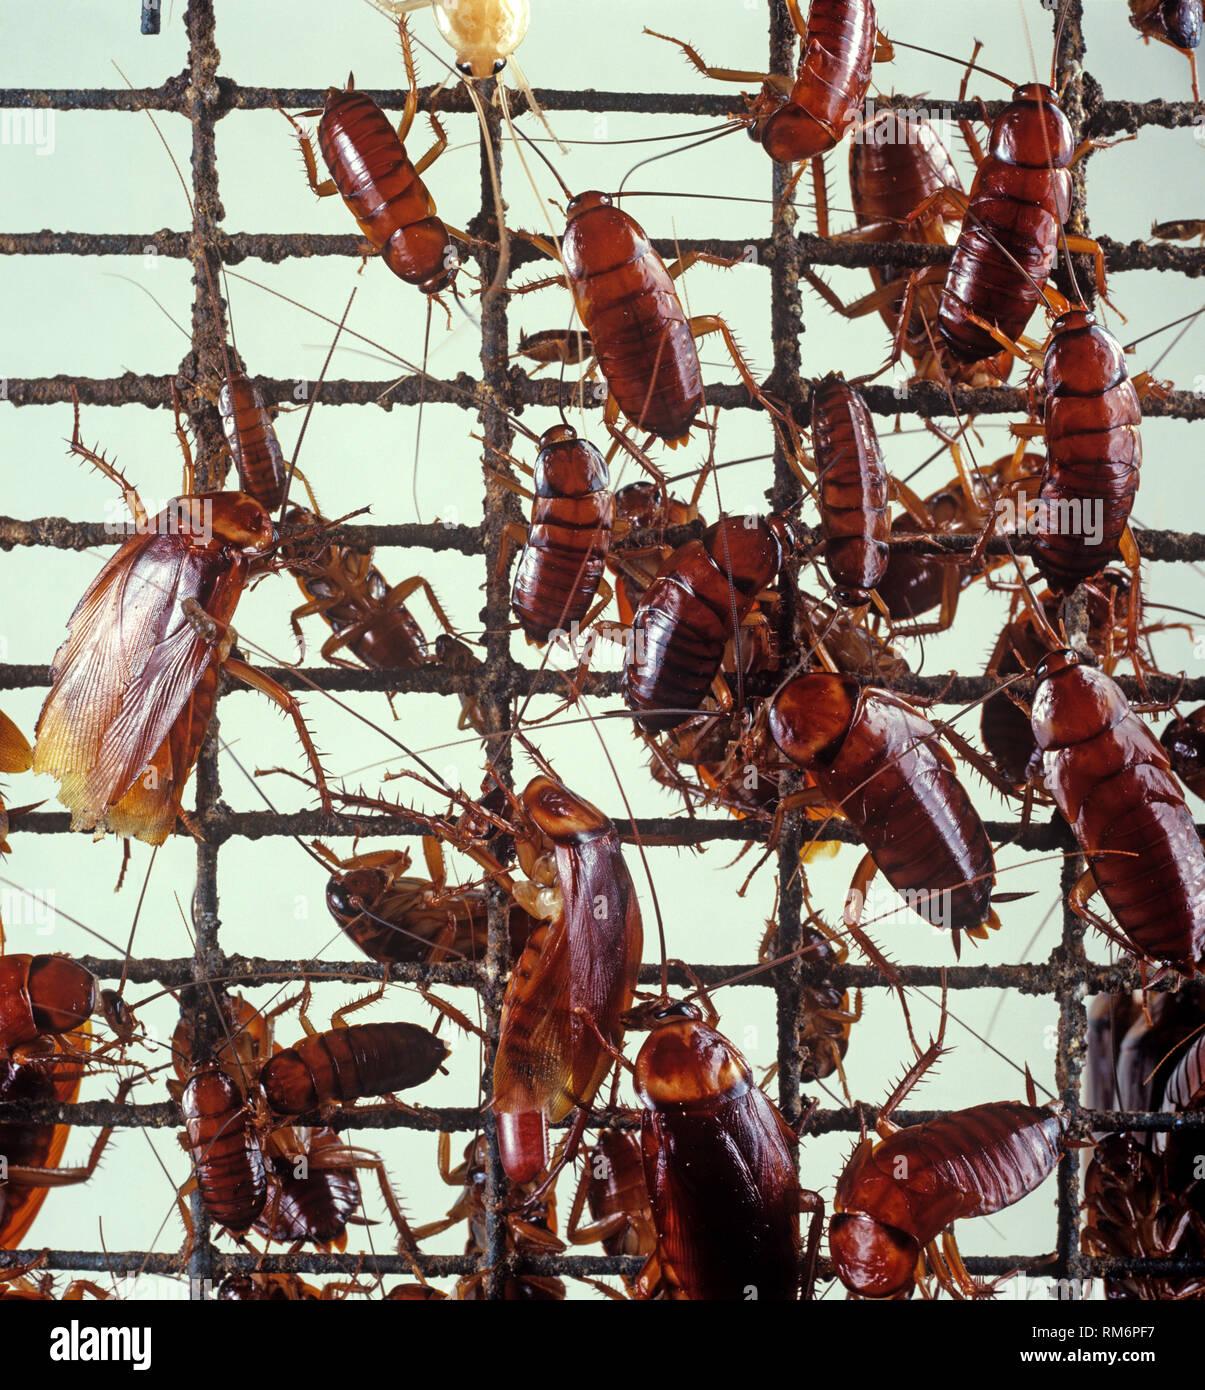 American cockroach (Periplaneta americana) a kitchen hygiene pest on wire mesh - Stock Image